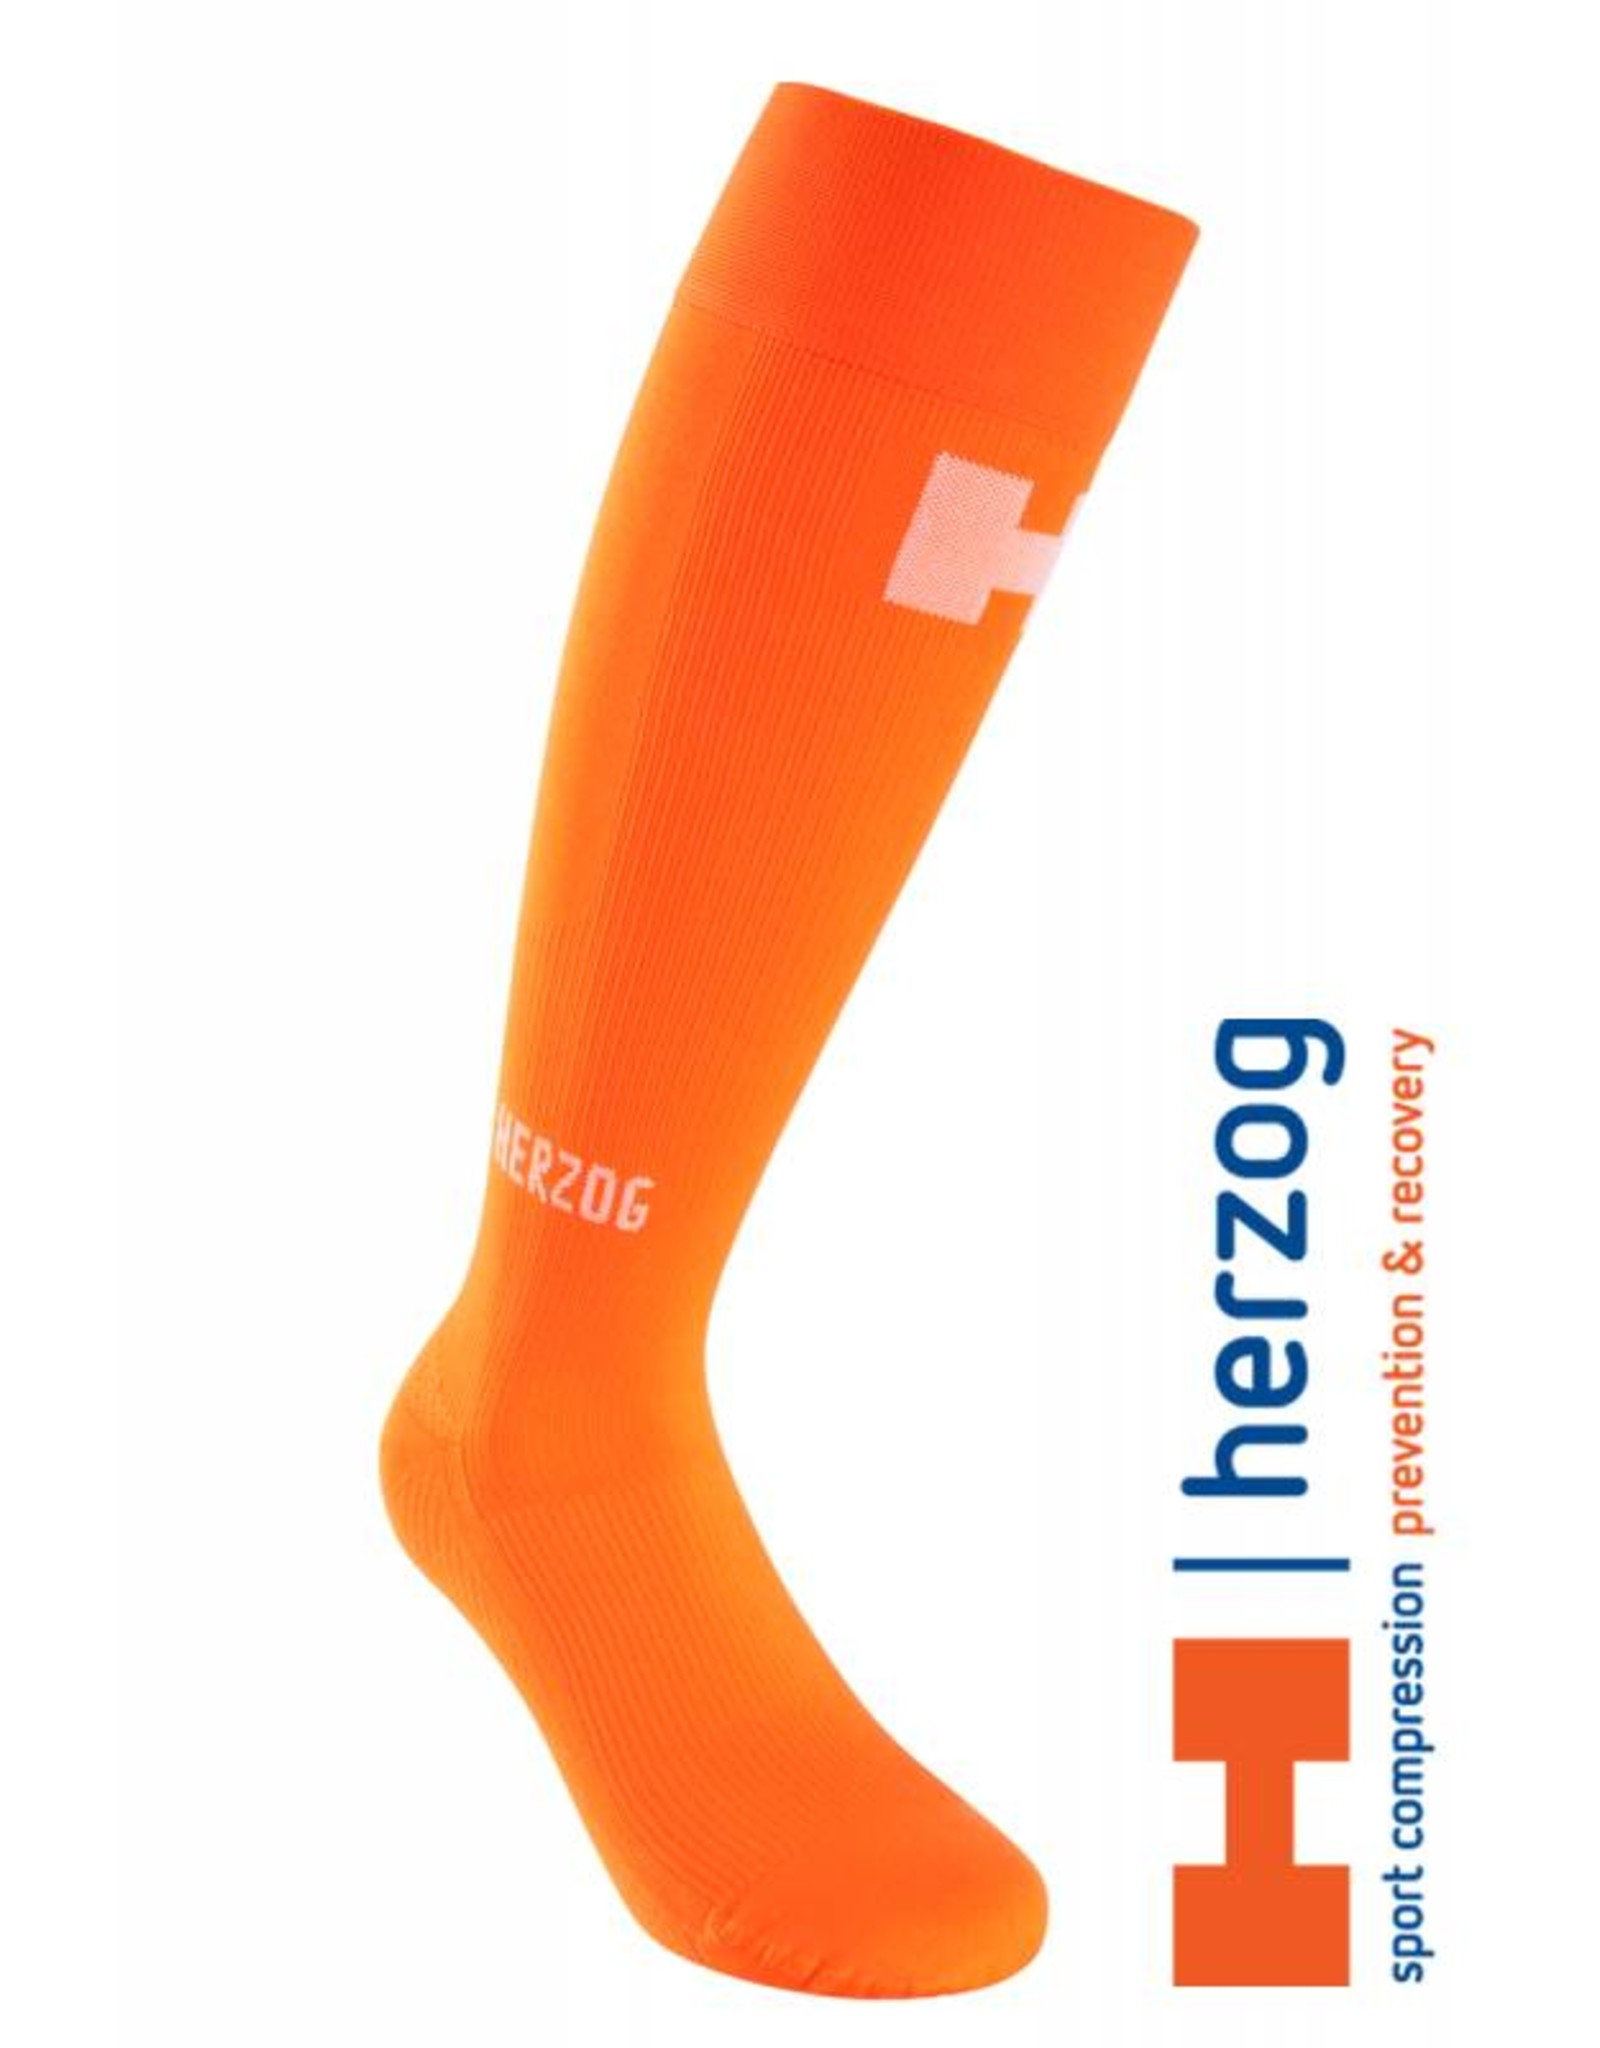 Herzog Sokken,  Pro Compressiekousen Oranje